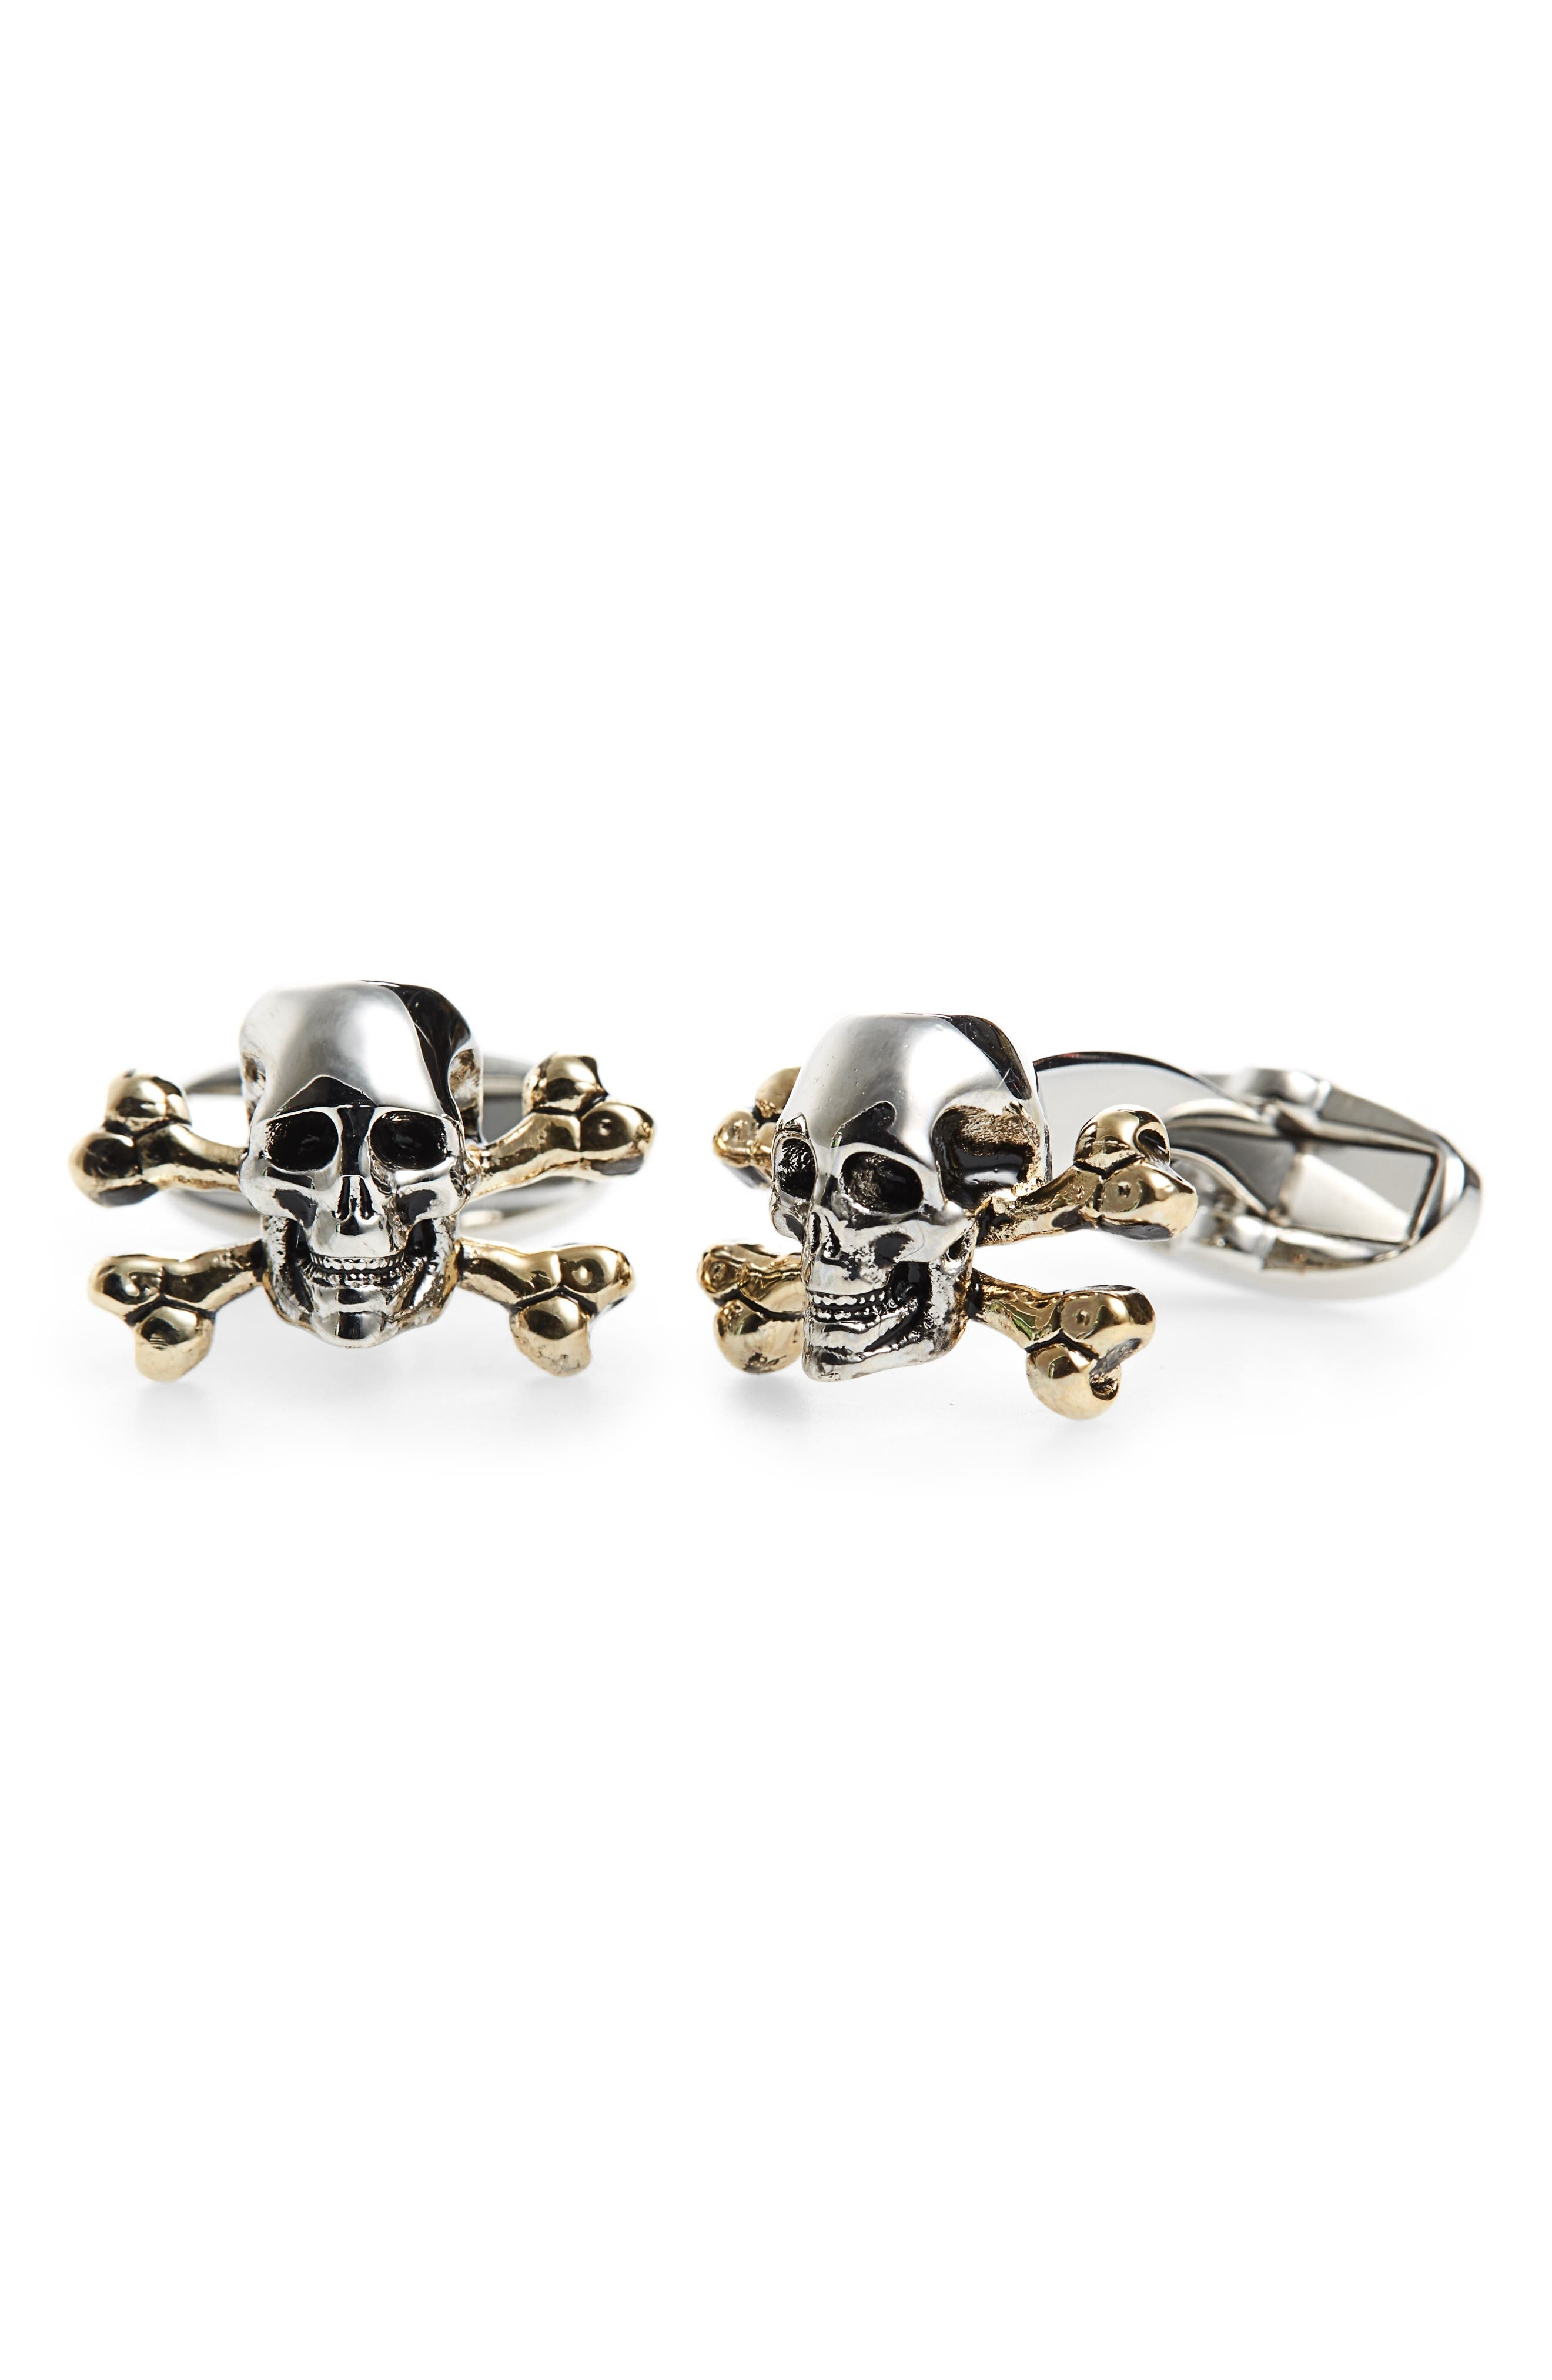 Main Image - Paul Smith Skull Cuff Links